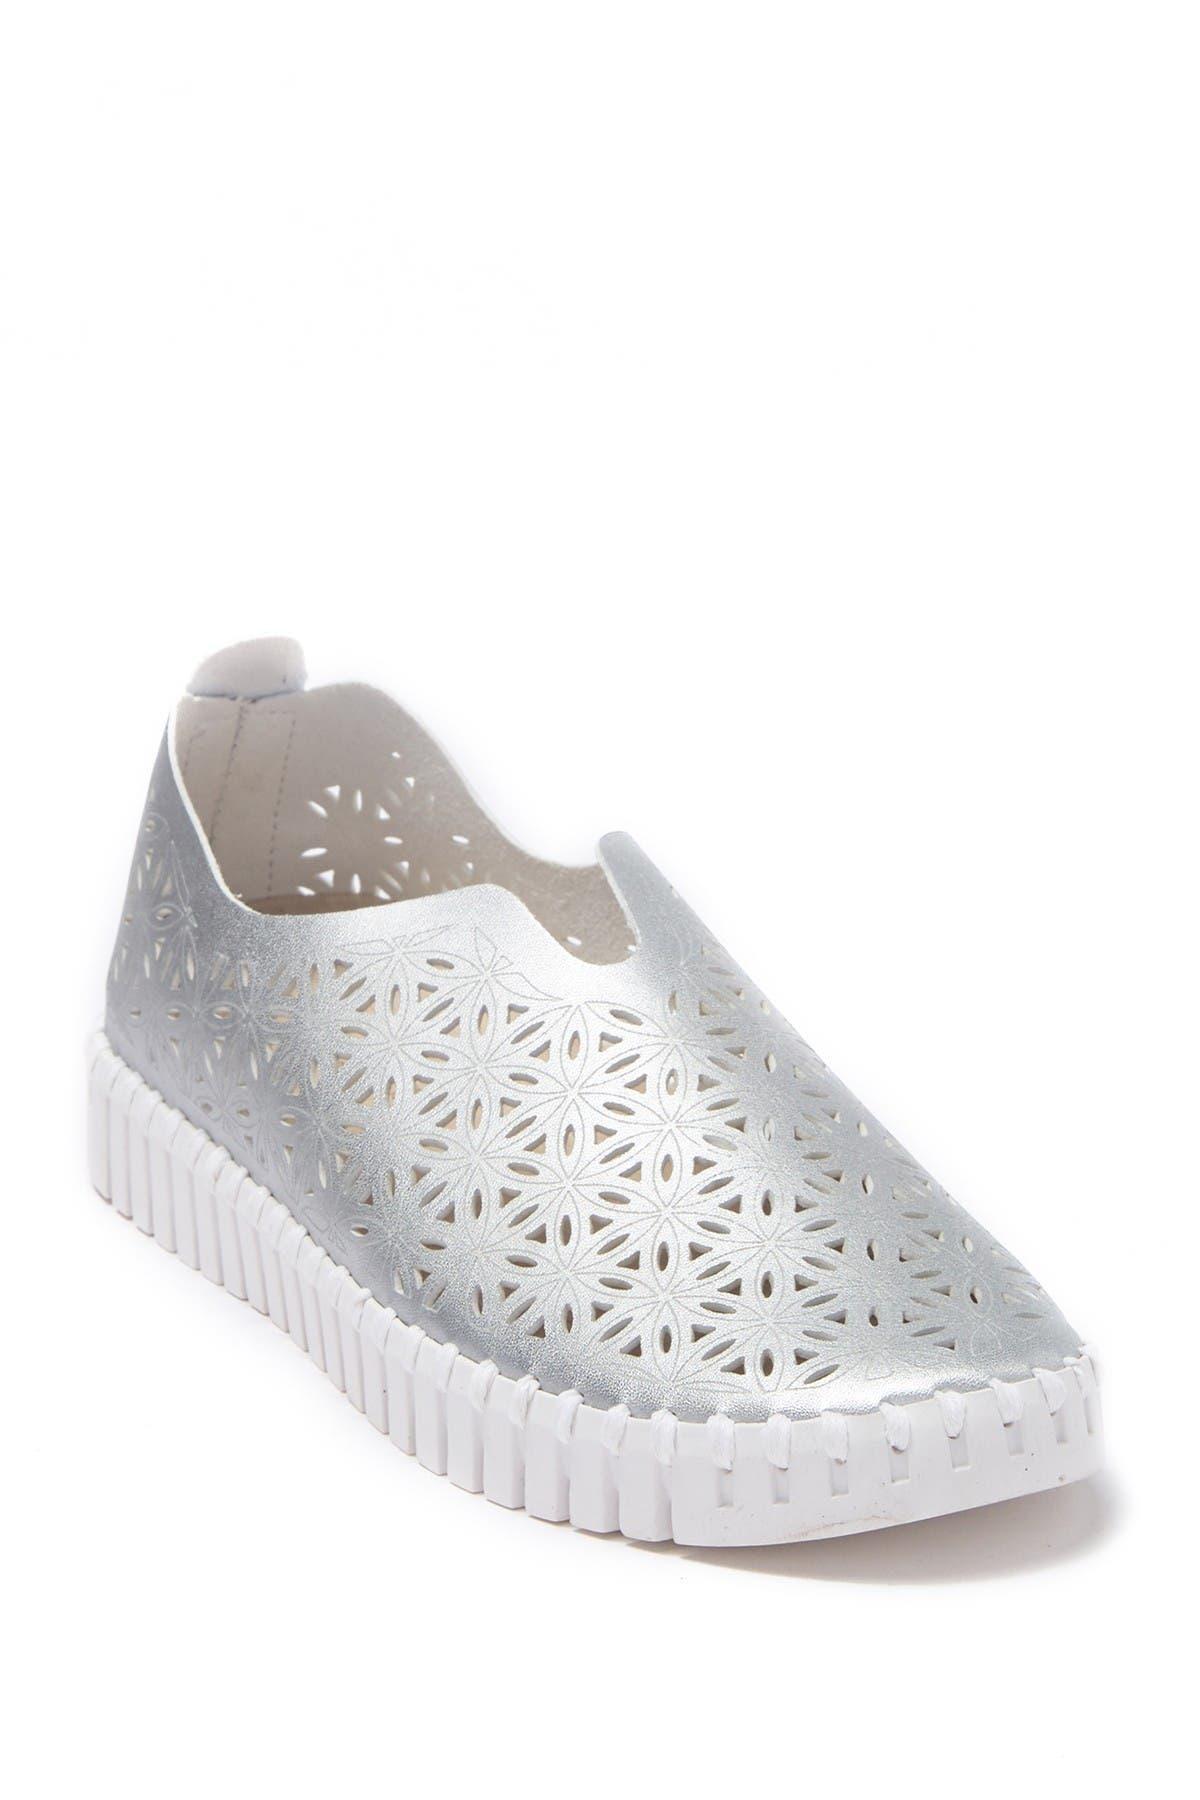 Tulip Perforated Slip-On Sneaker